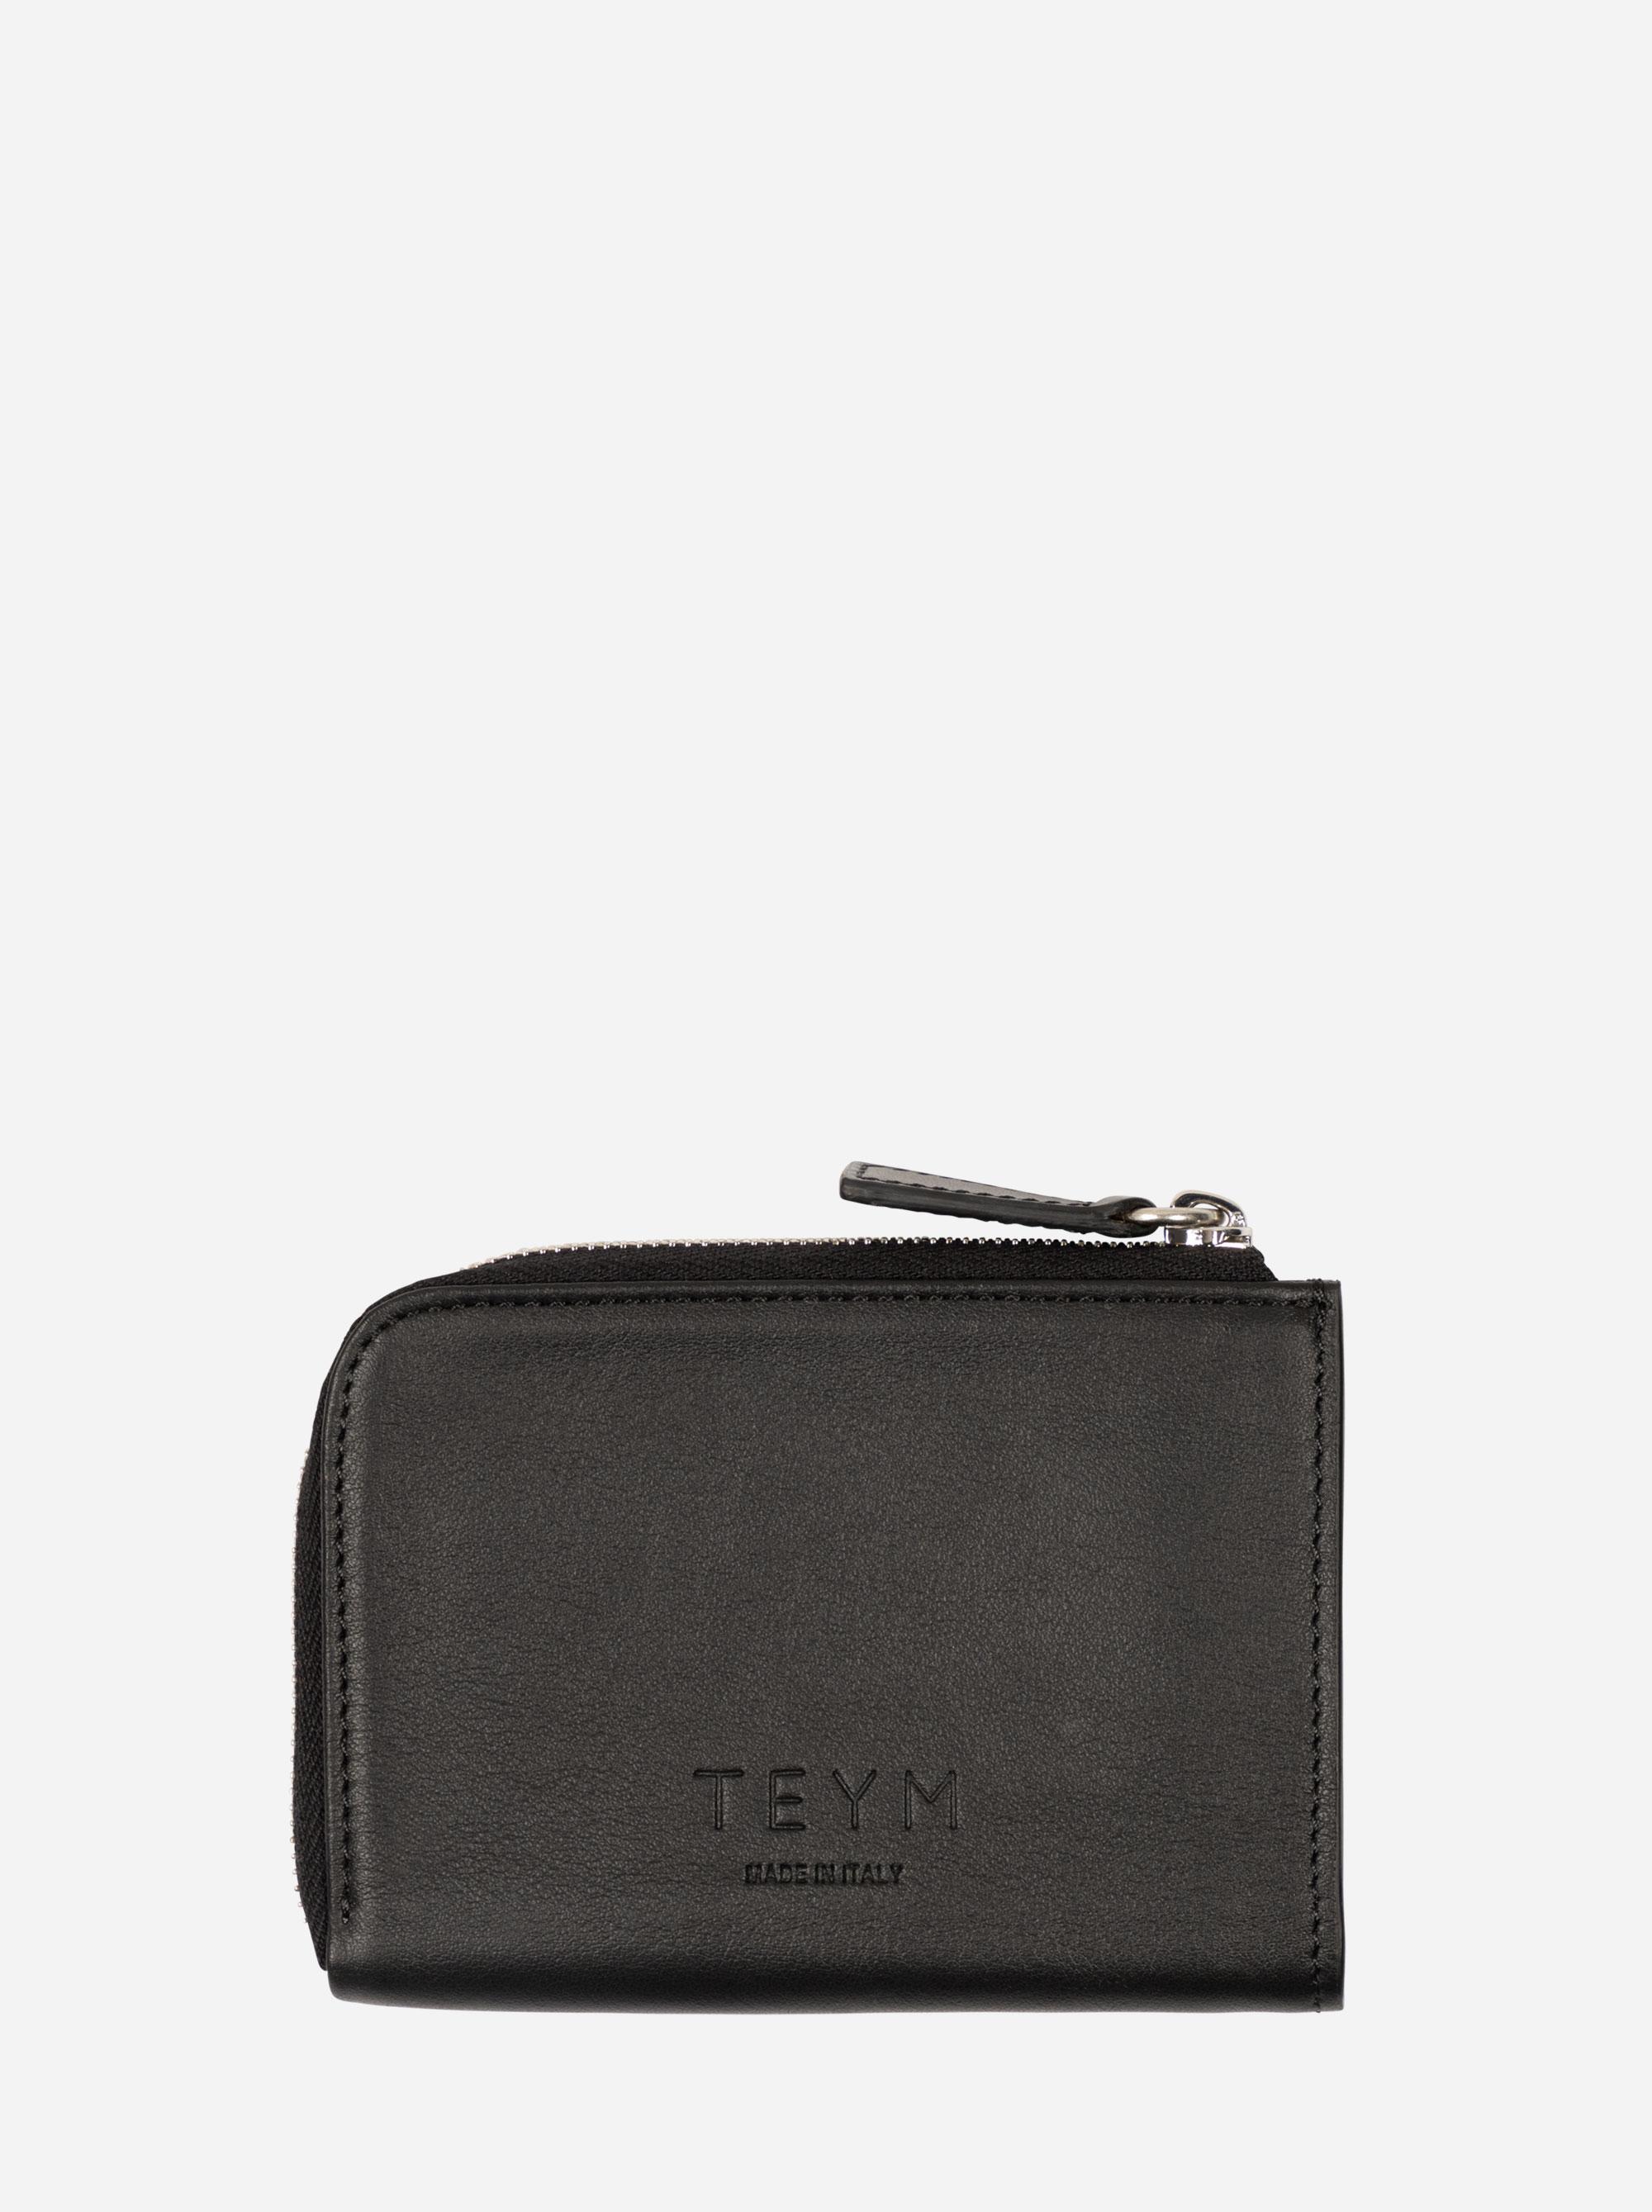 Teym - The Wallet - Black - 2